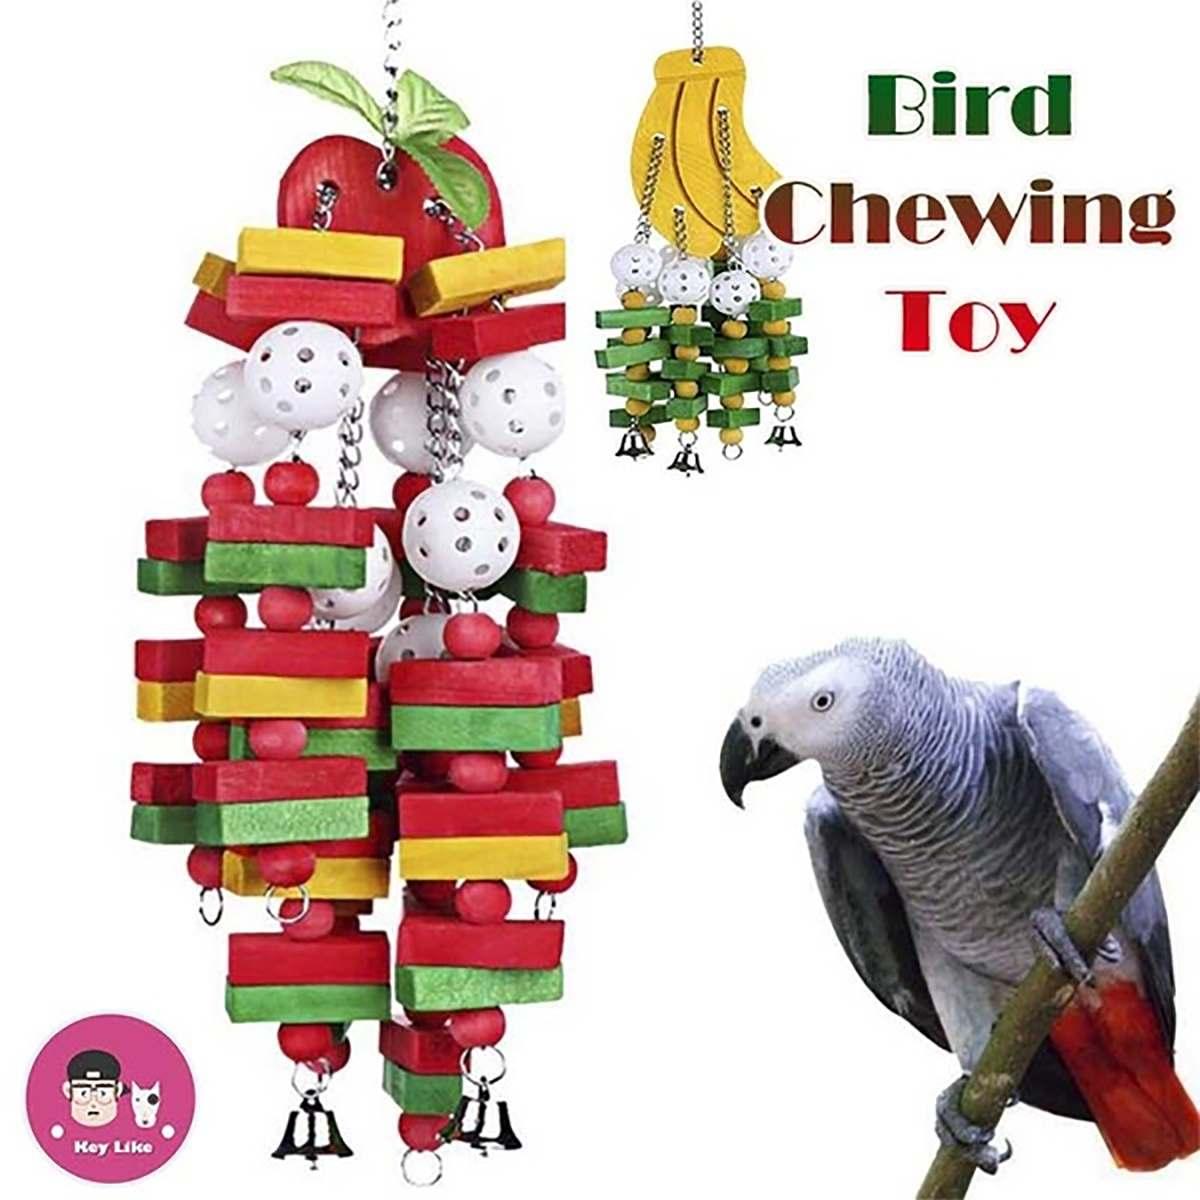 Bird Toys Chewing Playing Toys Large Medium Pet Parrot Cockatiel Parakeet Colorful Wooden Blocks Swing Food Grade Toys